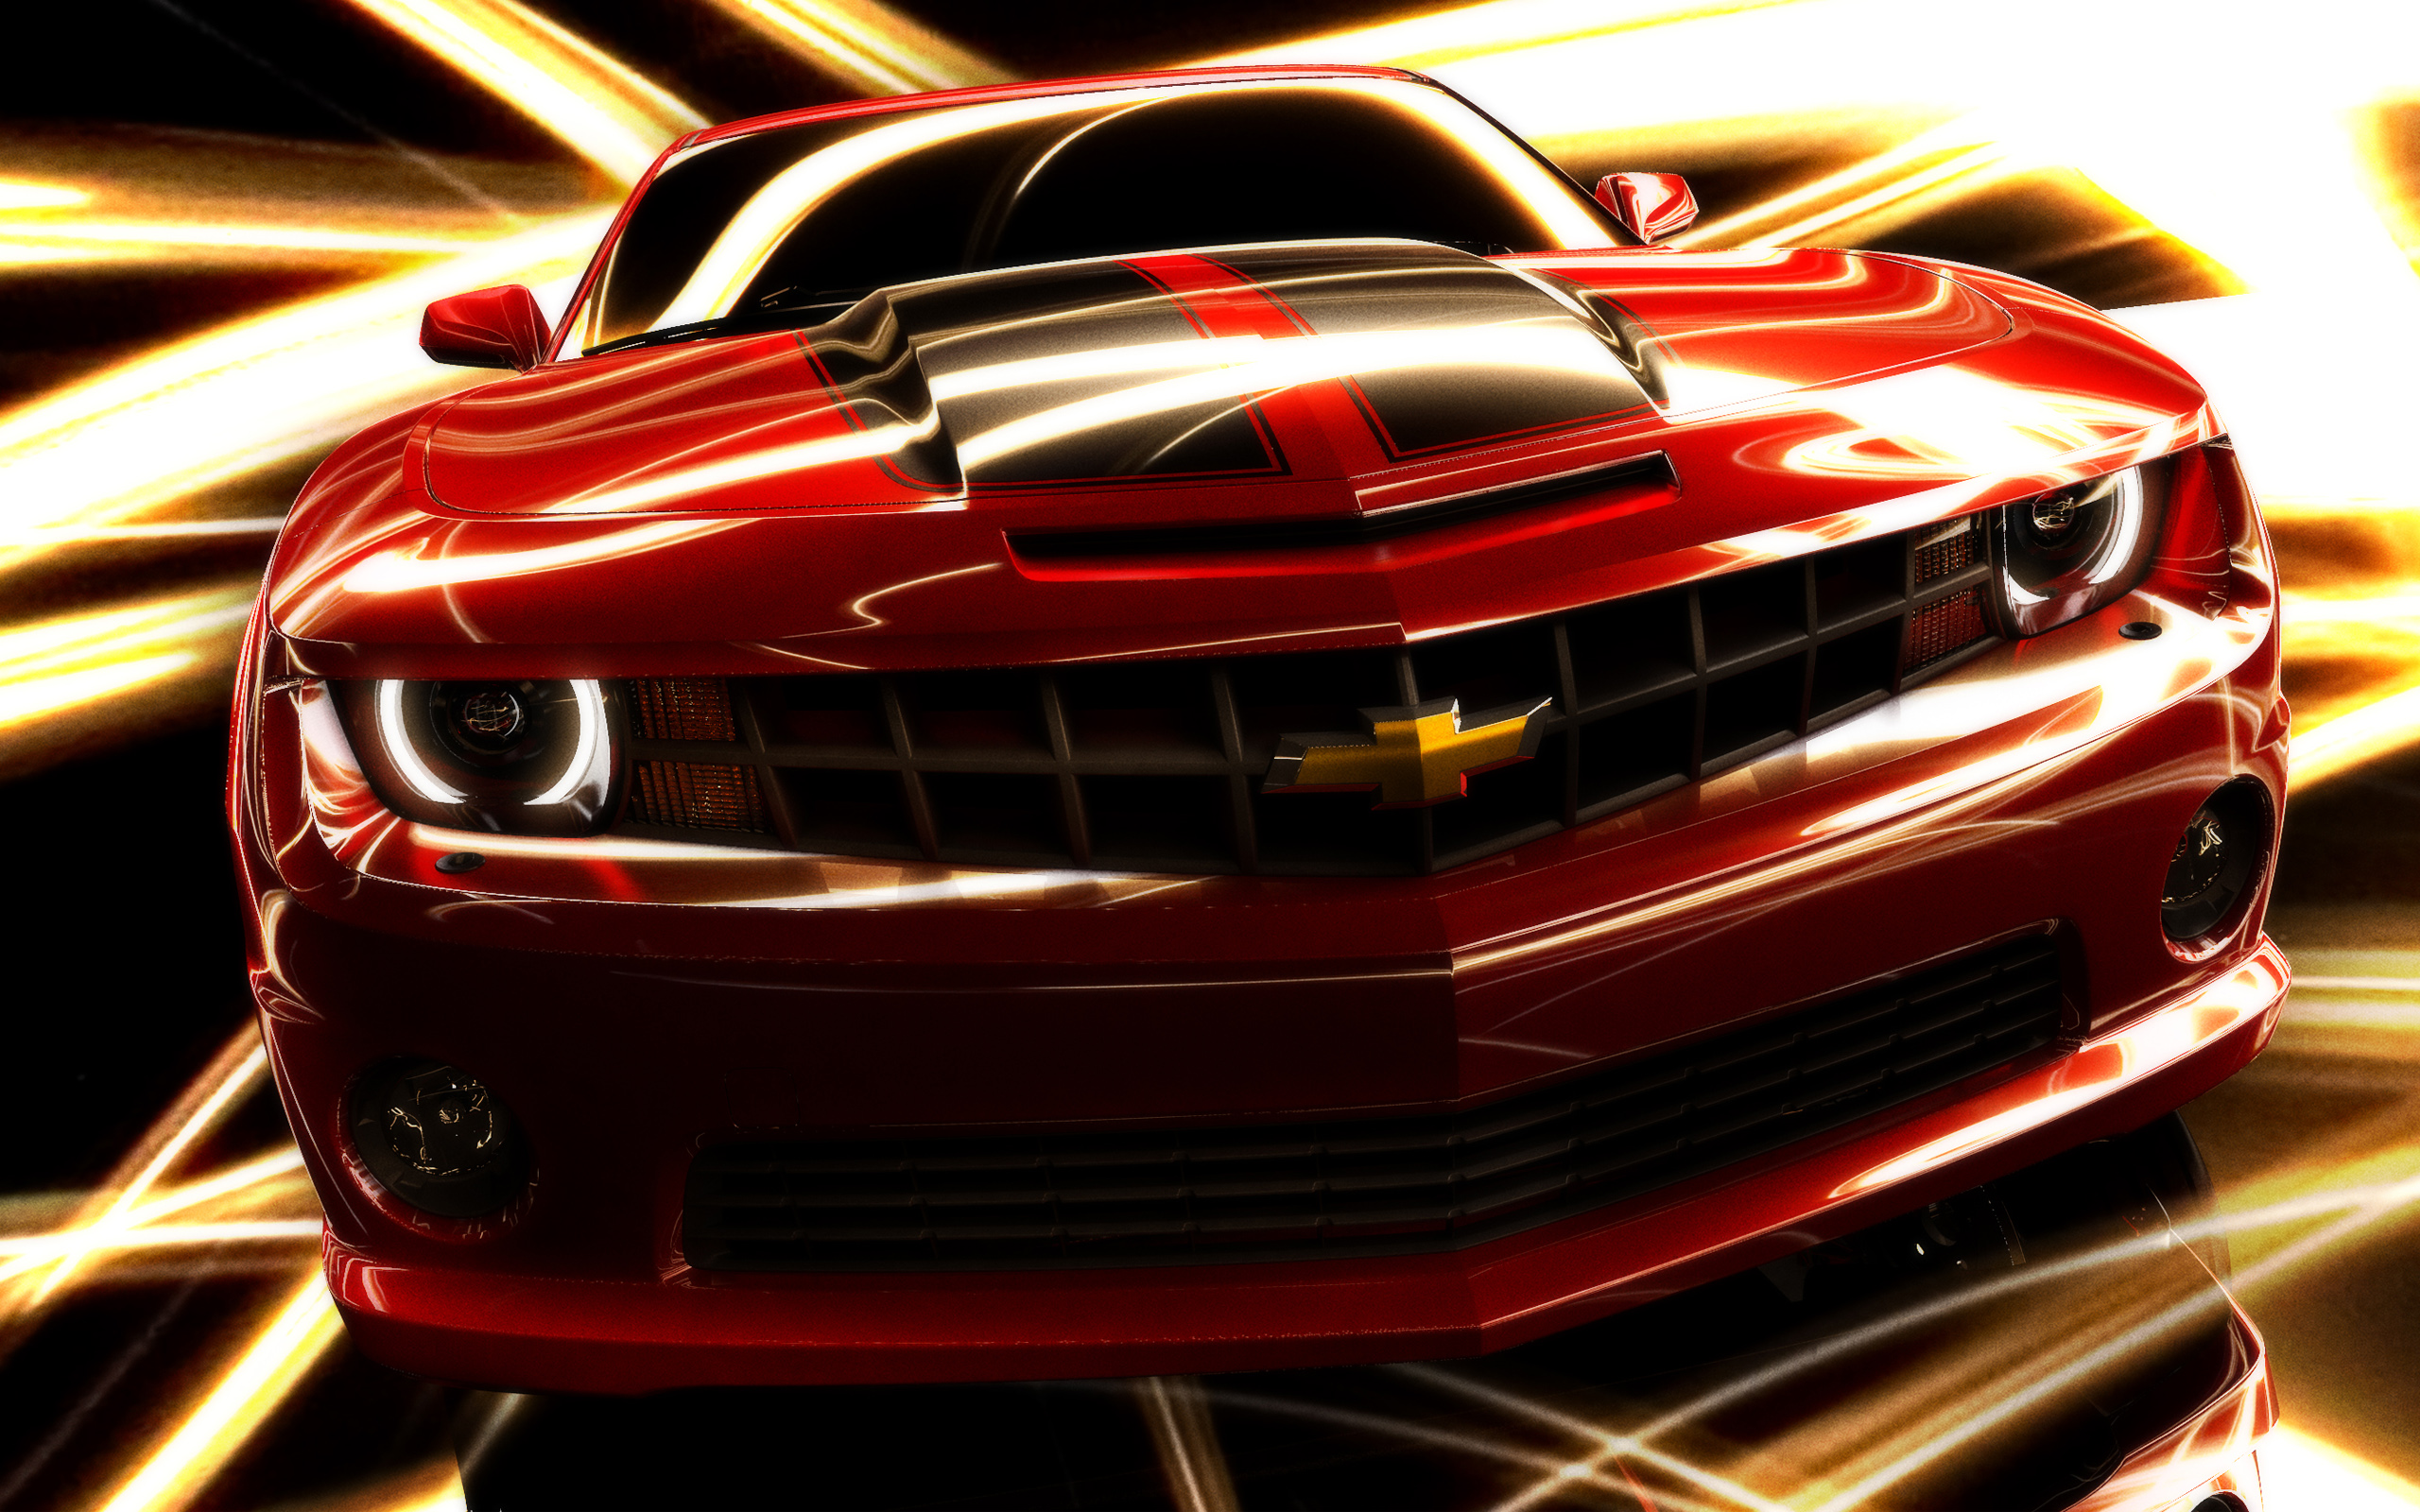 Hd Chevy Logo Wallpapers Wallpapersafari